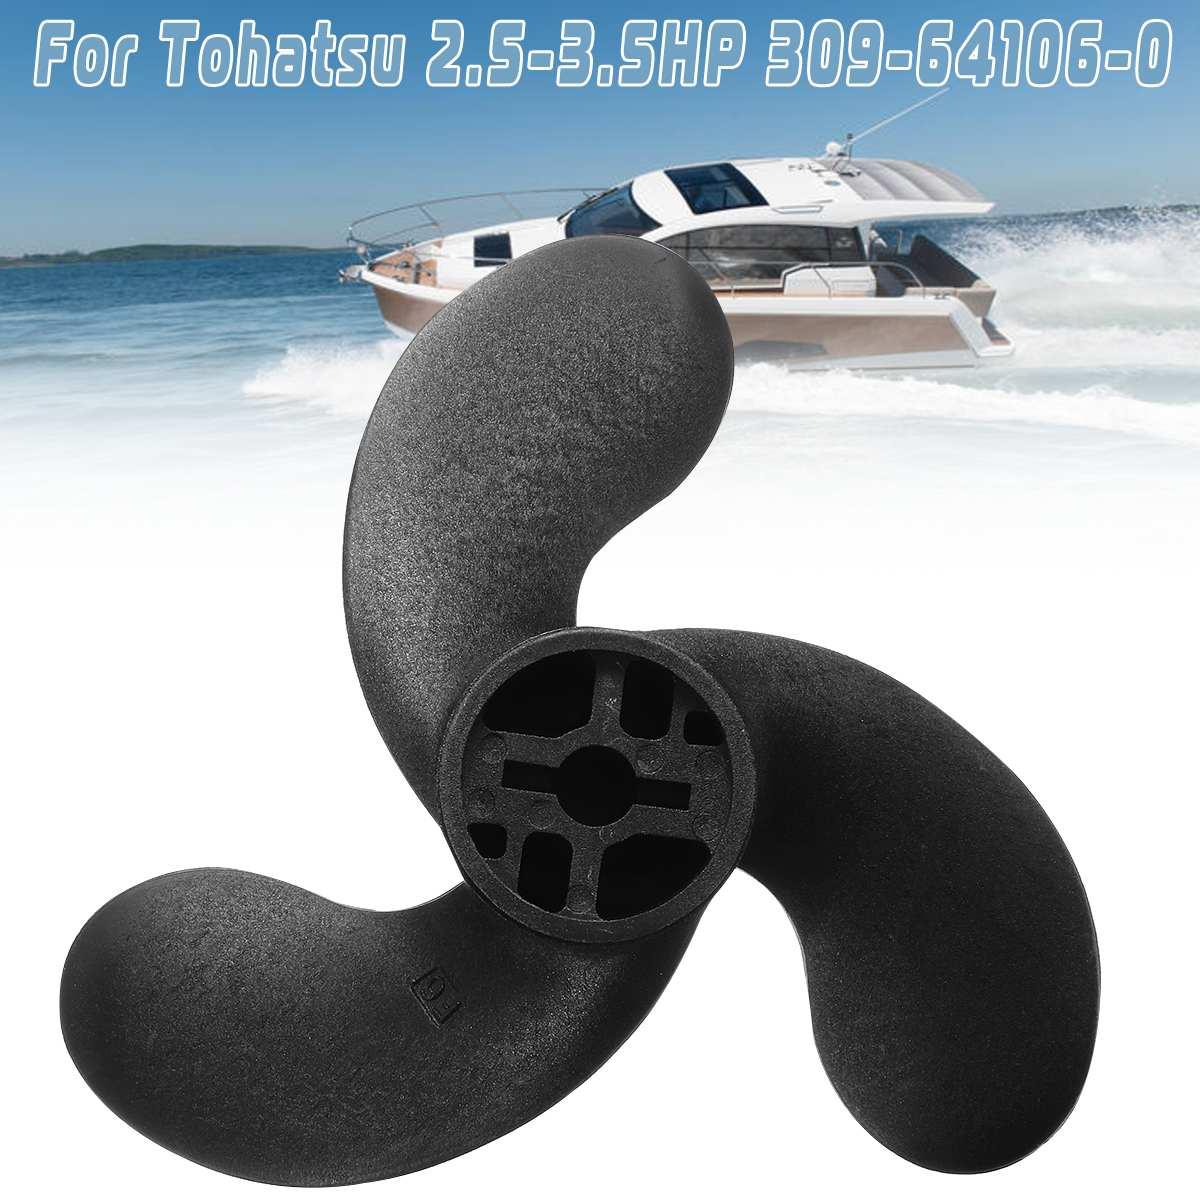 Boot Propeller 309-64107-0 7,4x5,7 Für Nissan Tohatsu Evinrude Johnson 2,5-3.5HP 3 Klingen R Rotation Verbund Kunststoff Material